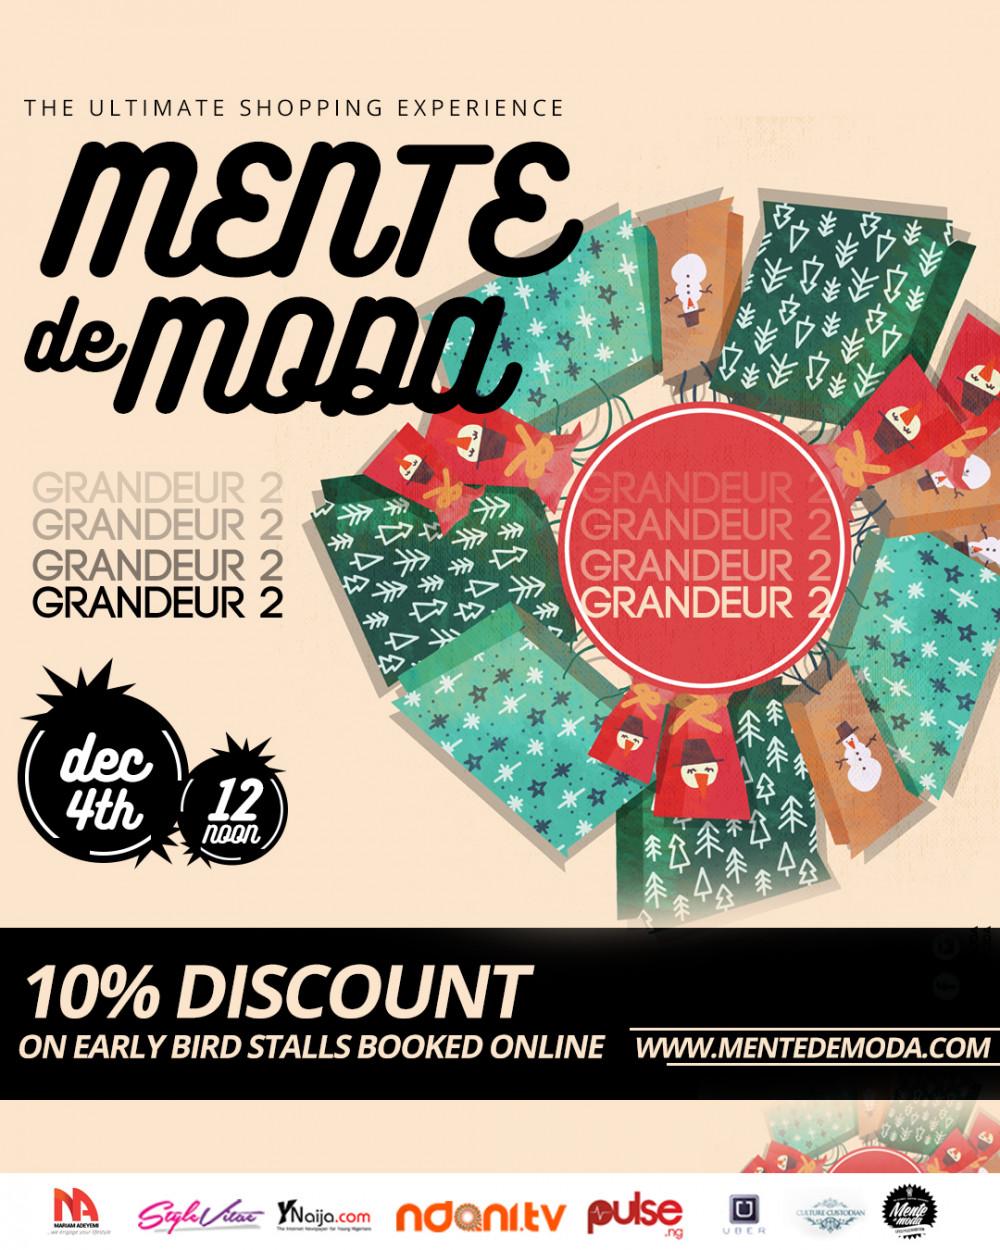 mdm-grandeur-2-new-discount-flyer